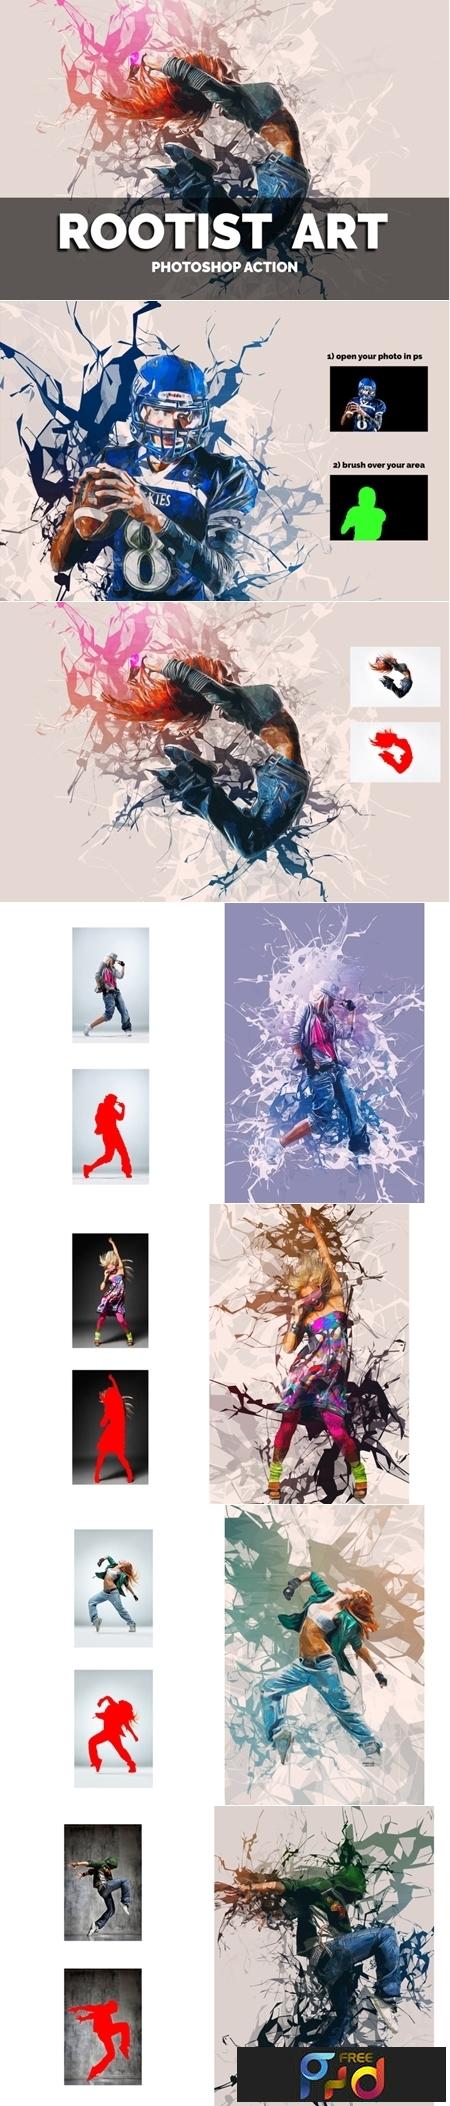 Rootist Art Photoshop Action 3548627 1